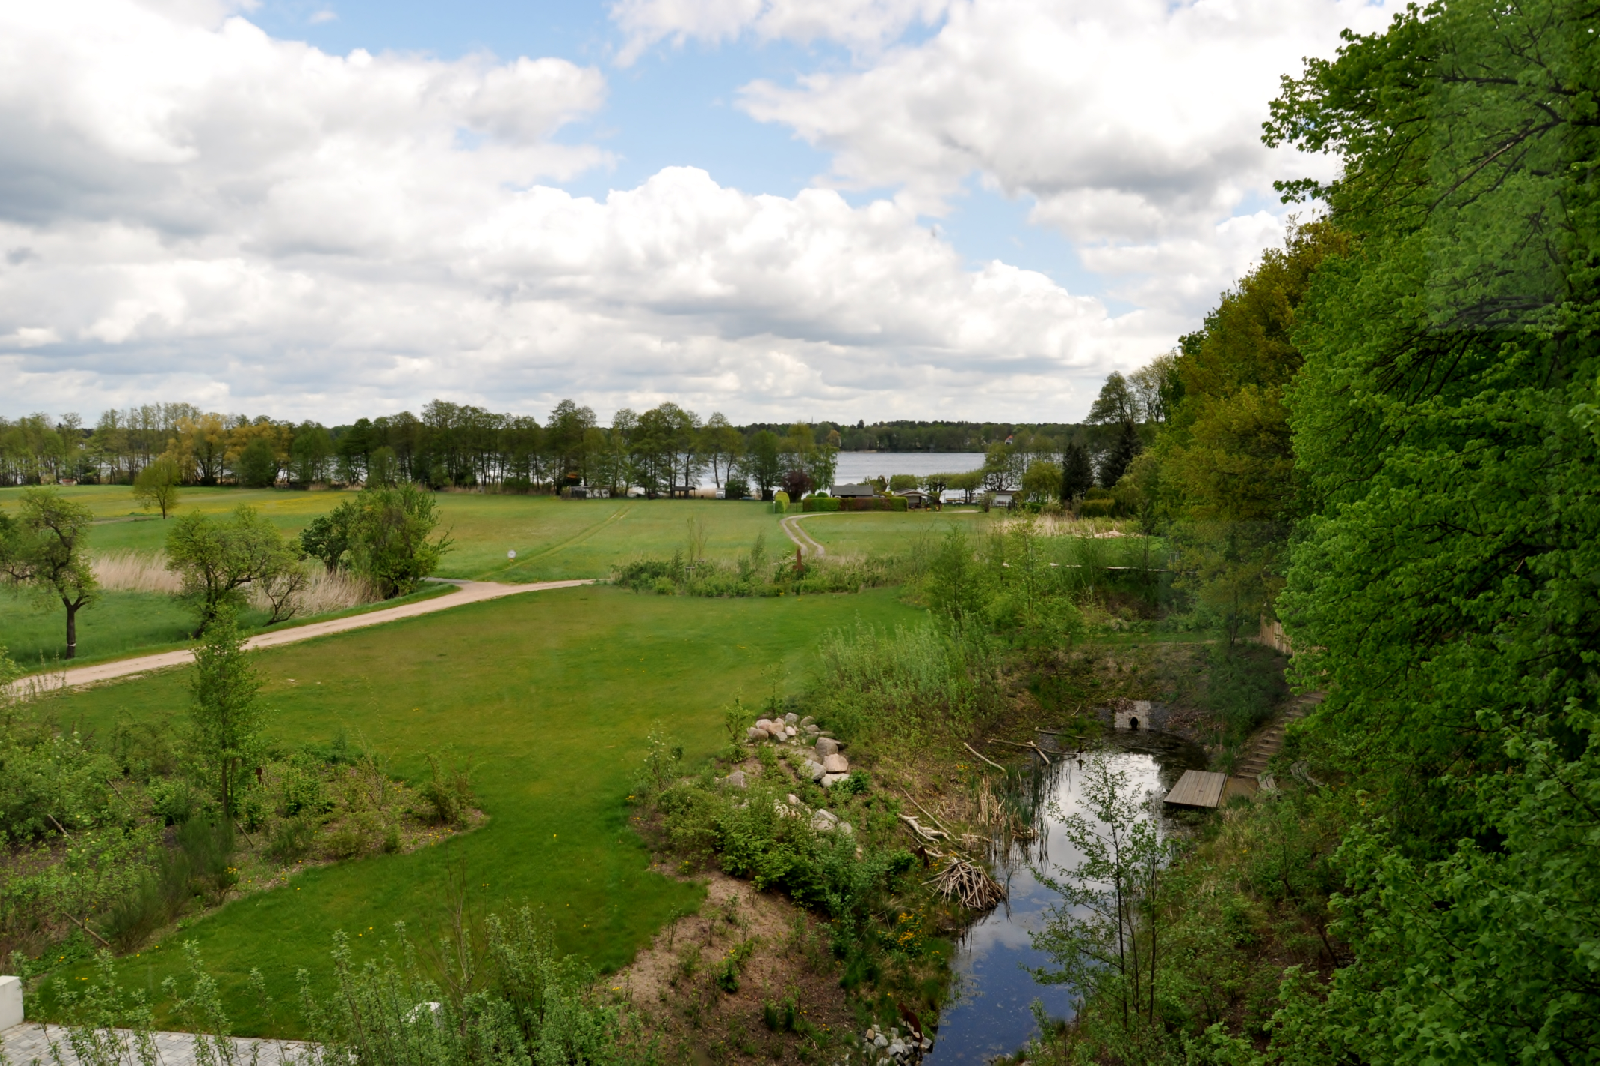 Barnim_Panorama_Seeblicke_1_Foto_Gerigk